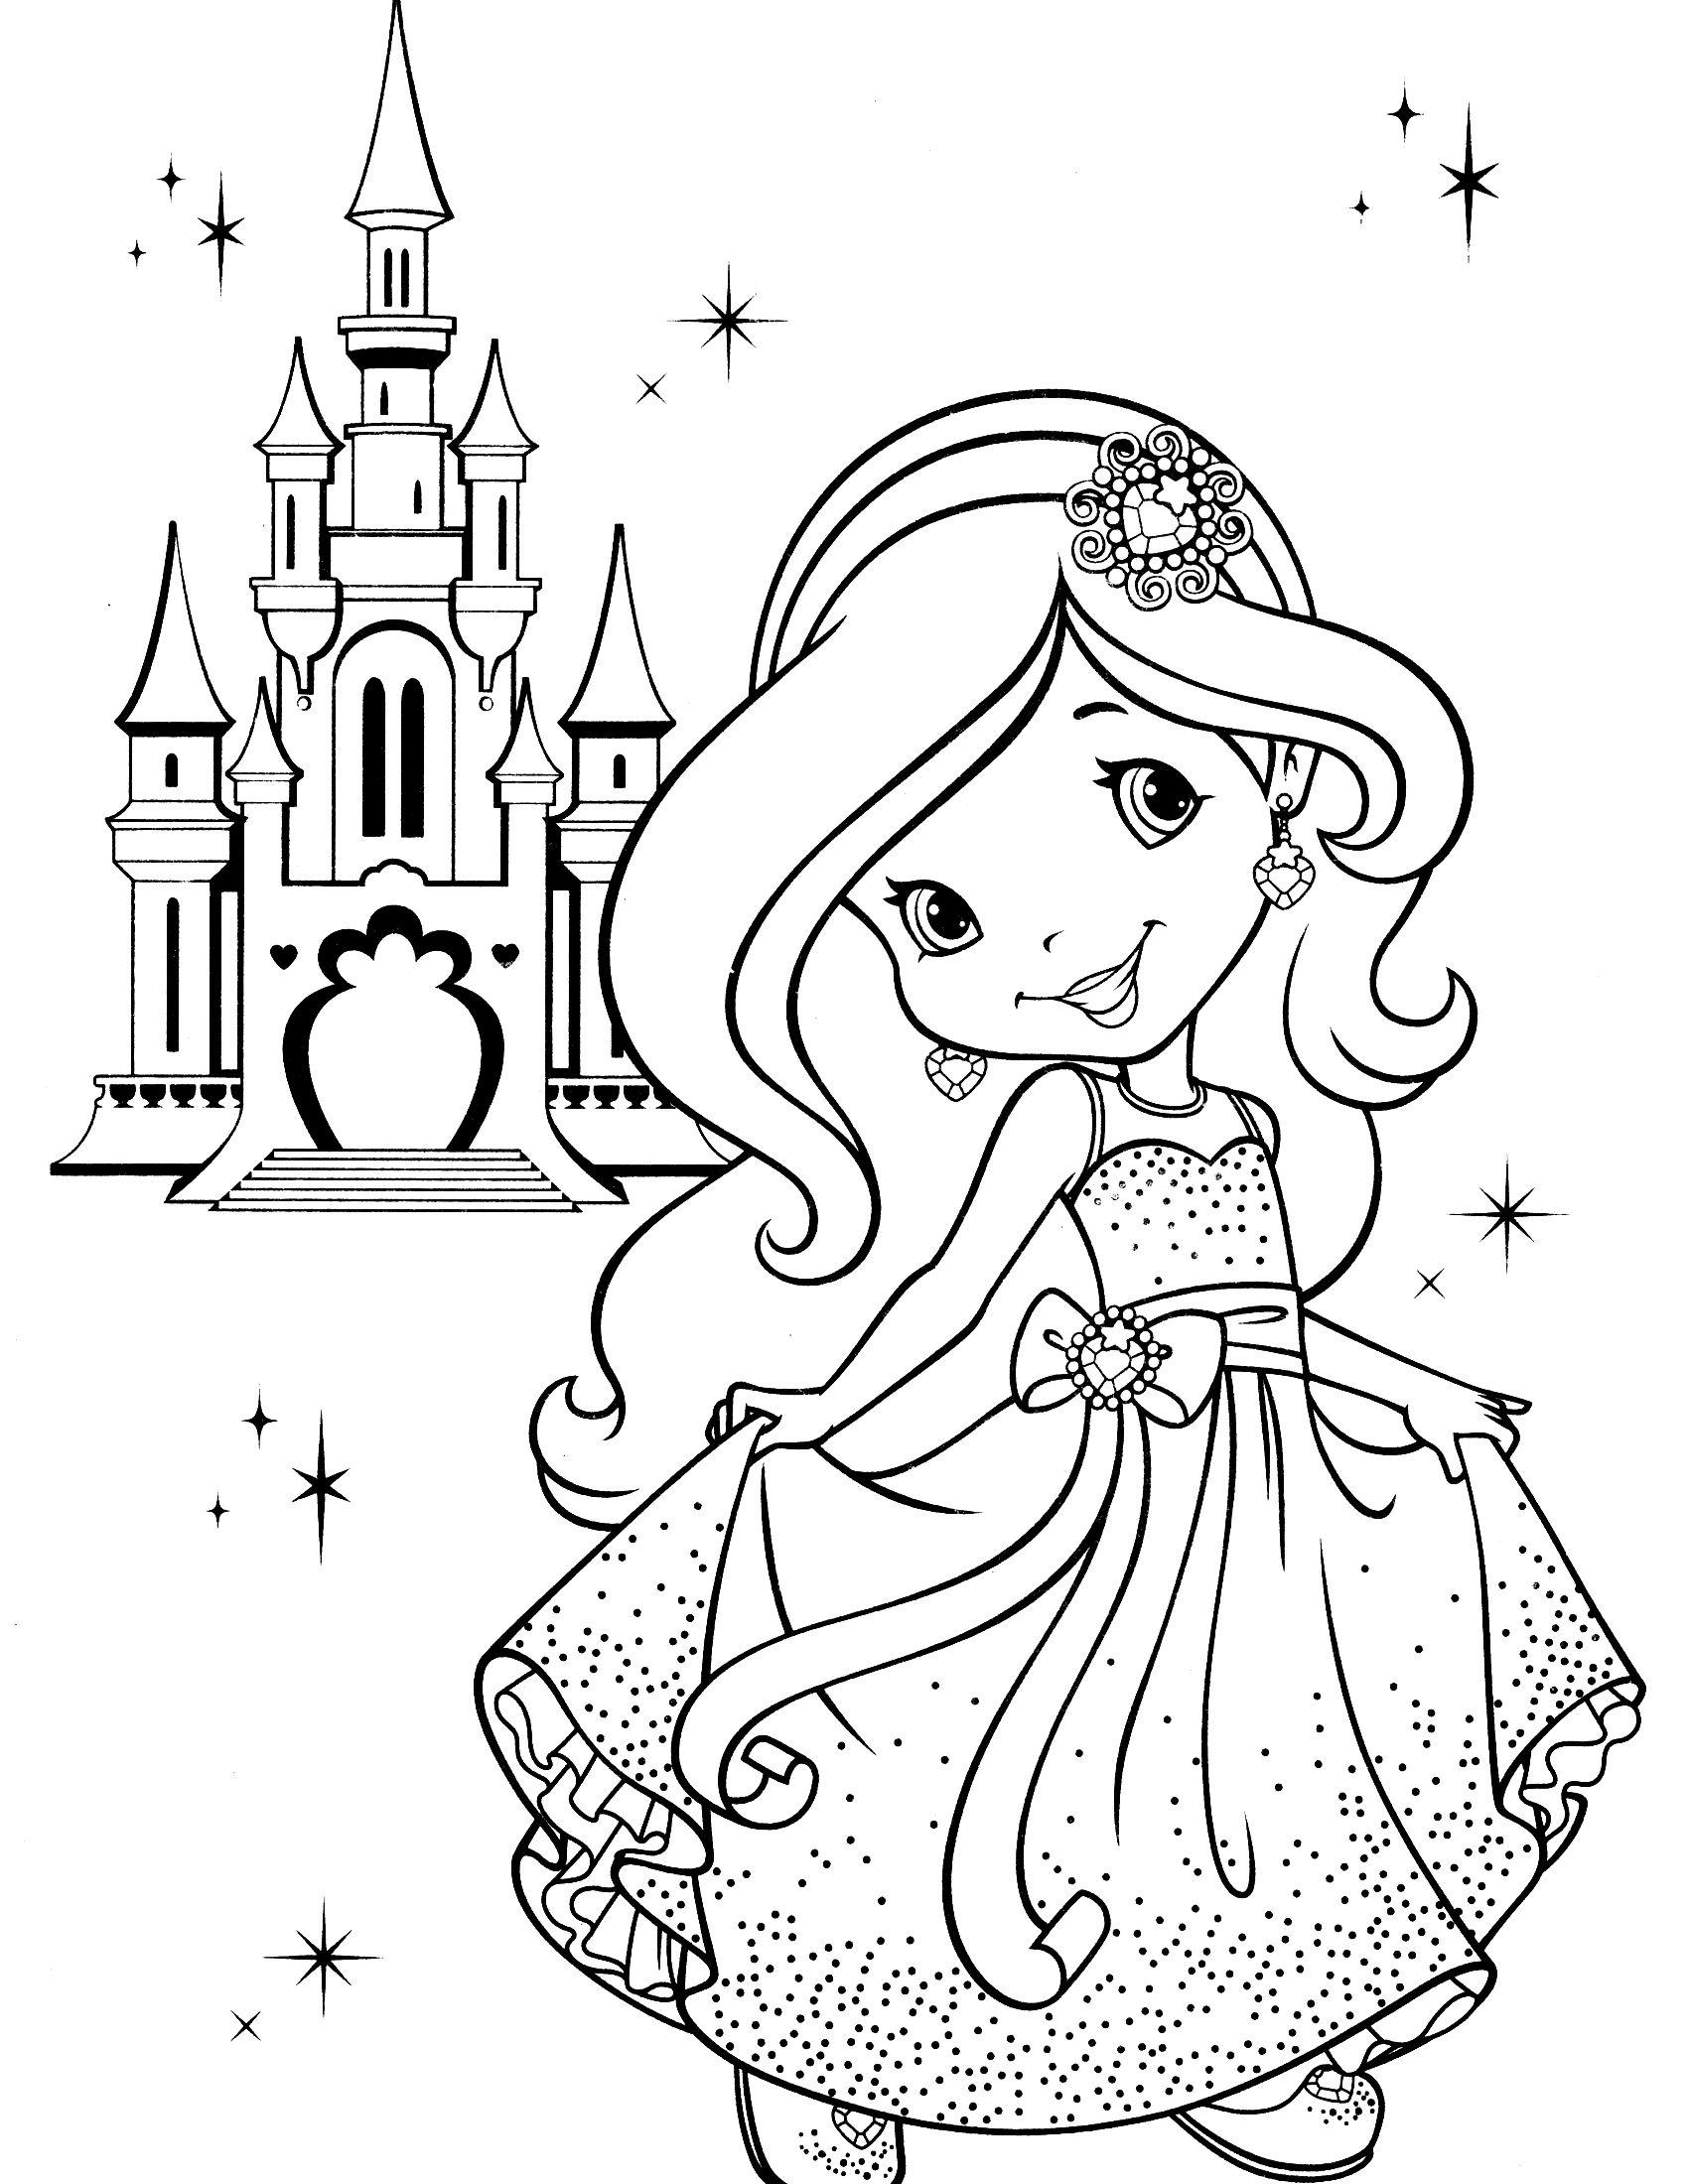 Strawberry Shortcake Coloring Page | Crafts | Princess